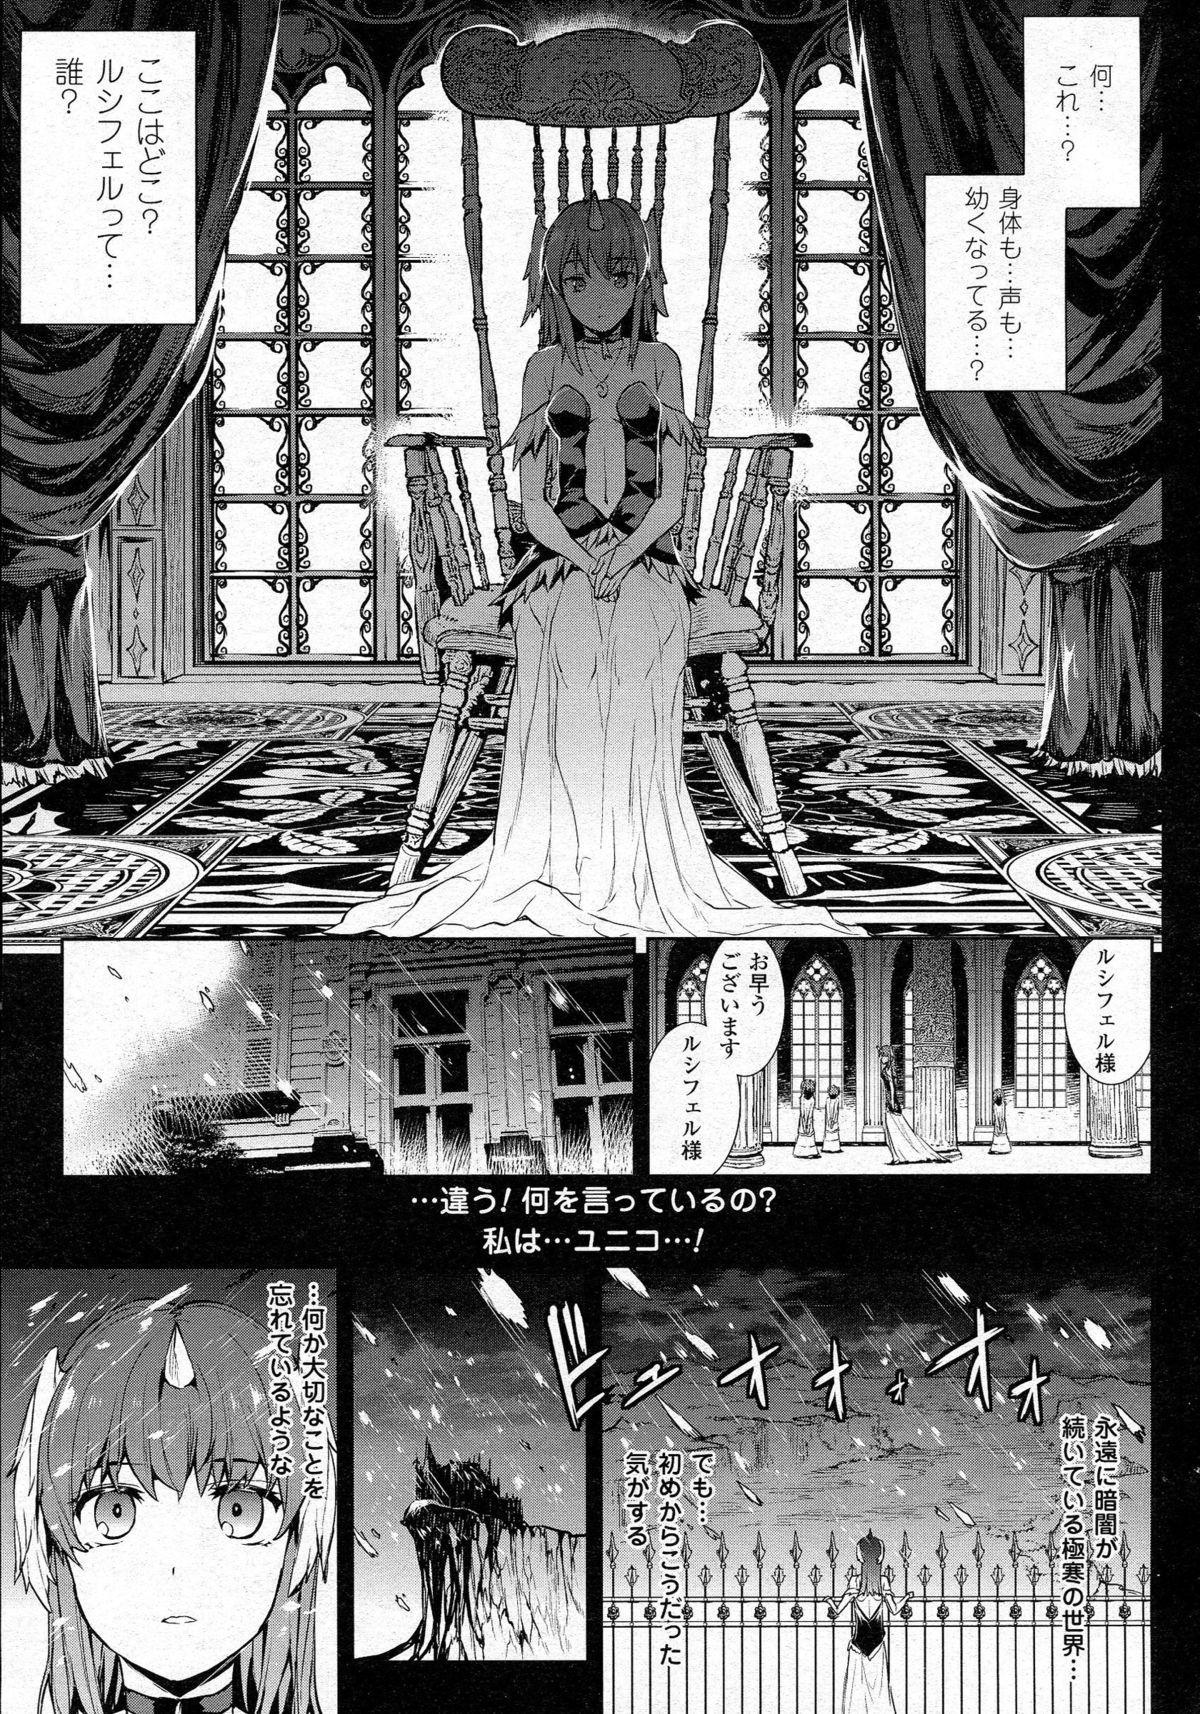 COMIC Unreal 2015-06 Vol. 55 + Hisasi Illust Shuu 41